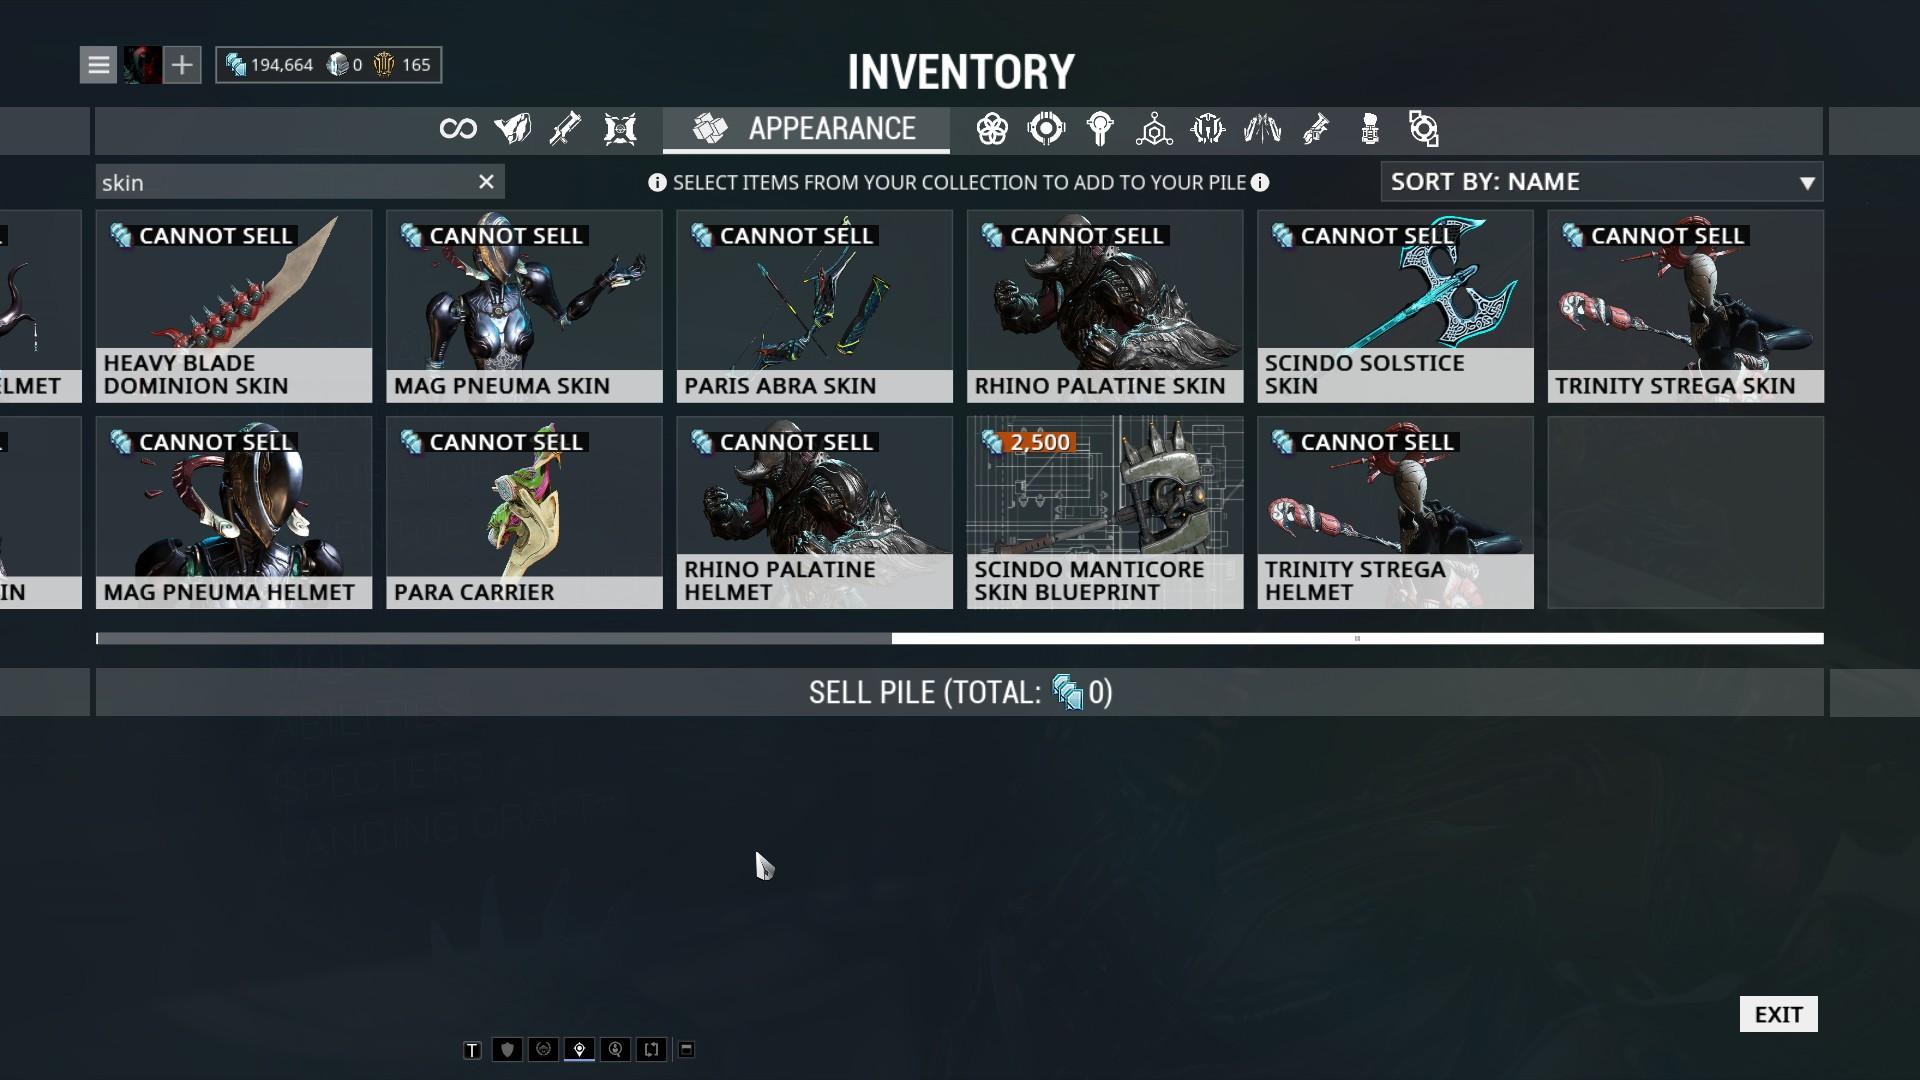 Seafight Add On Cd Keygen For Games - Warframe Mastery Rank 5 Weapons List , HD Wallpaper & Backgrounds